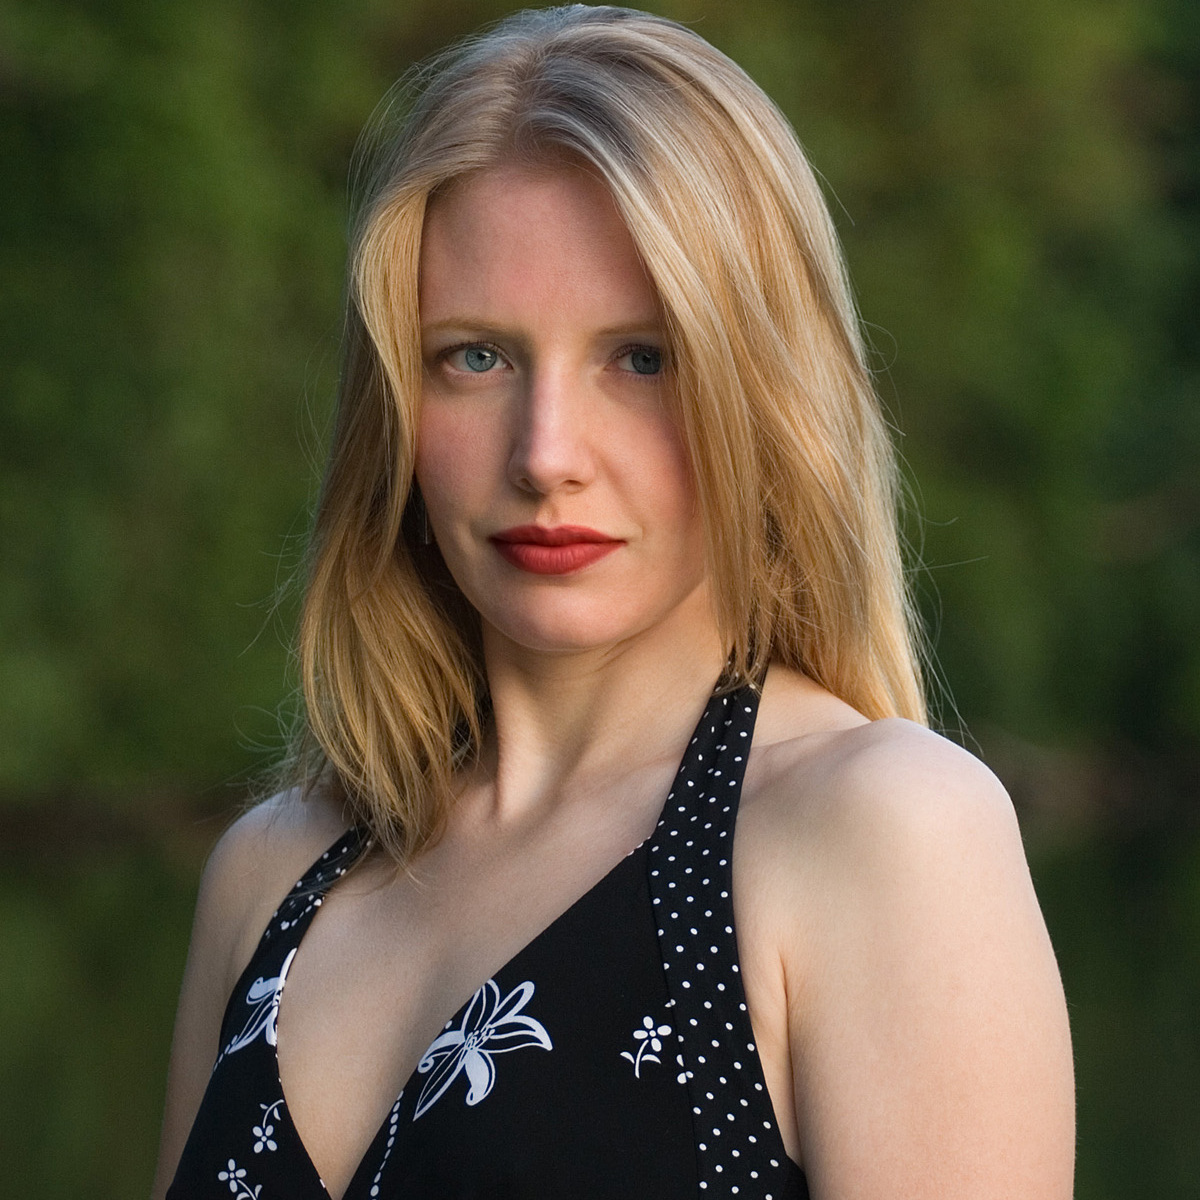 Michelle Kuiper